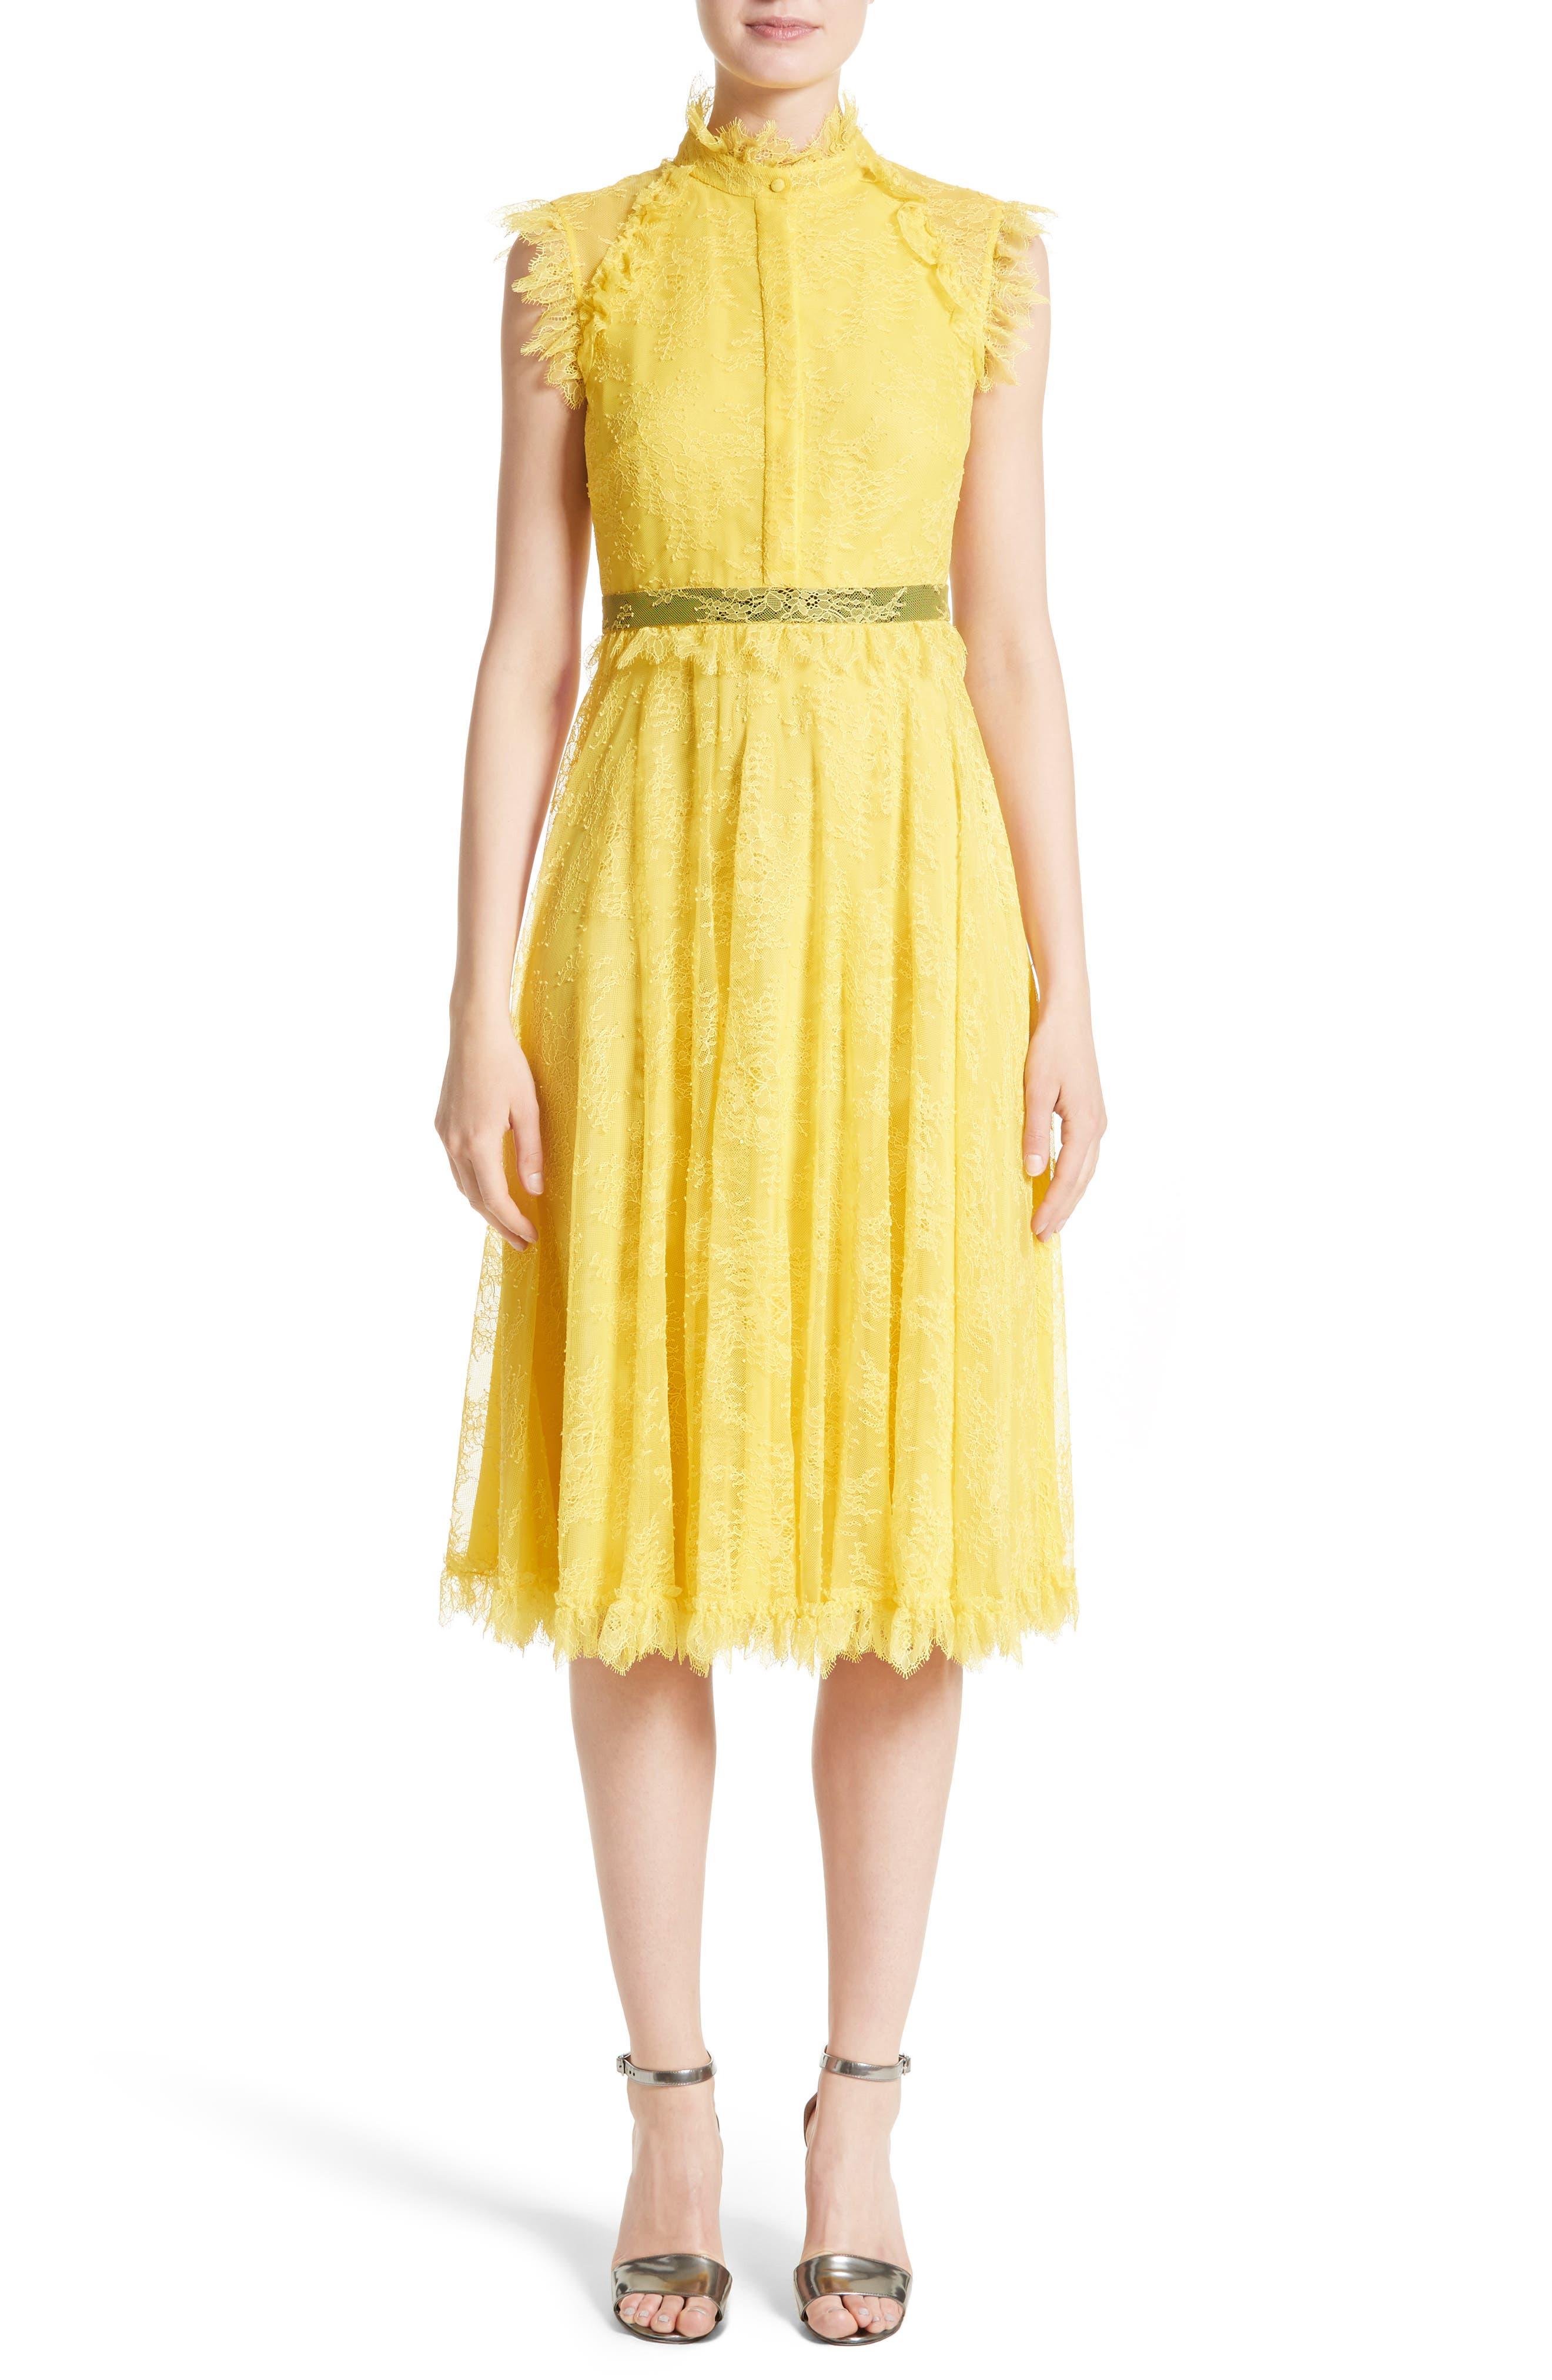 Alternate Image 1 Selected - Erdem Tulle Lace Dress